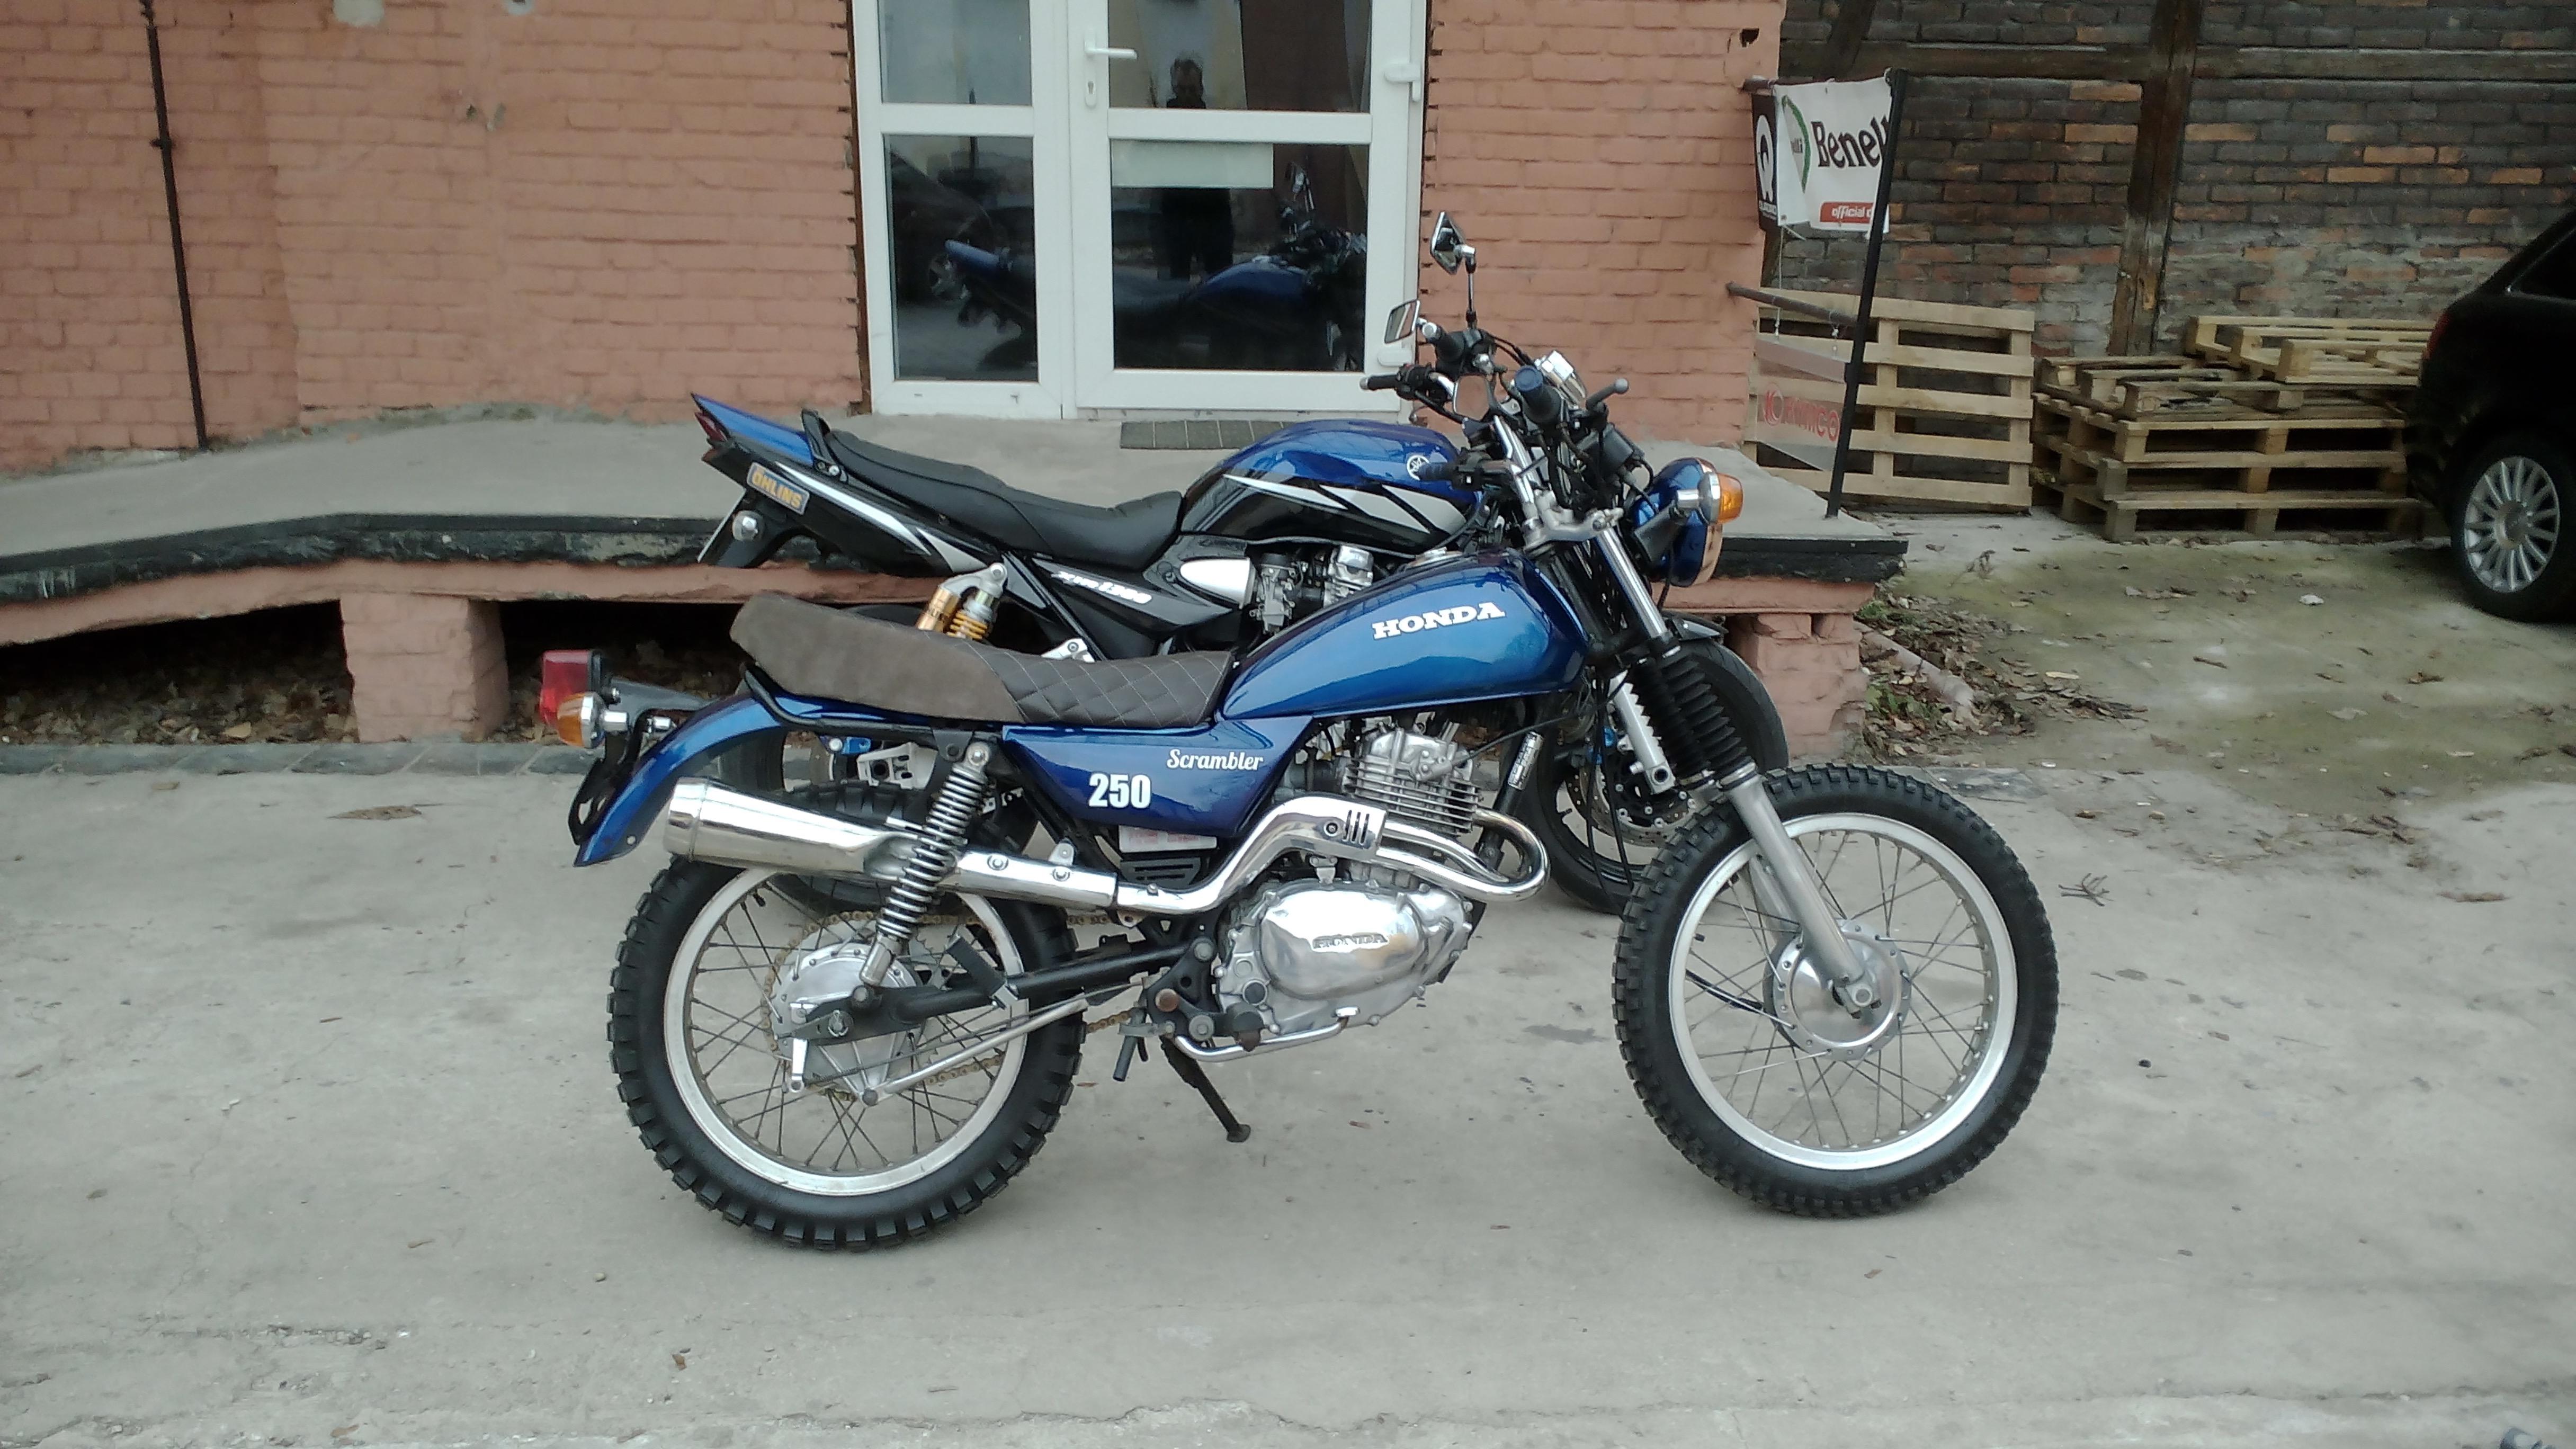 Honda Scrambler 250 & Yamaha XJR 1300